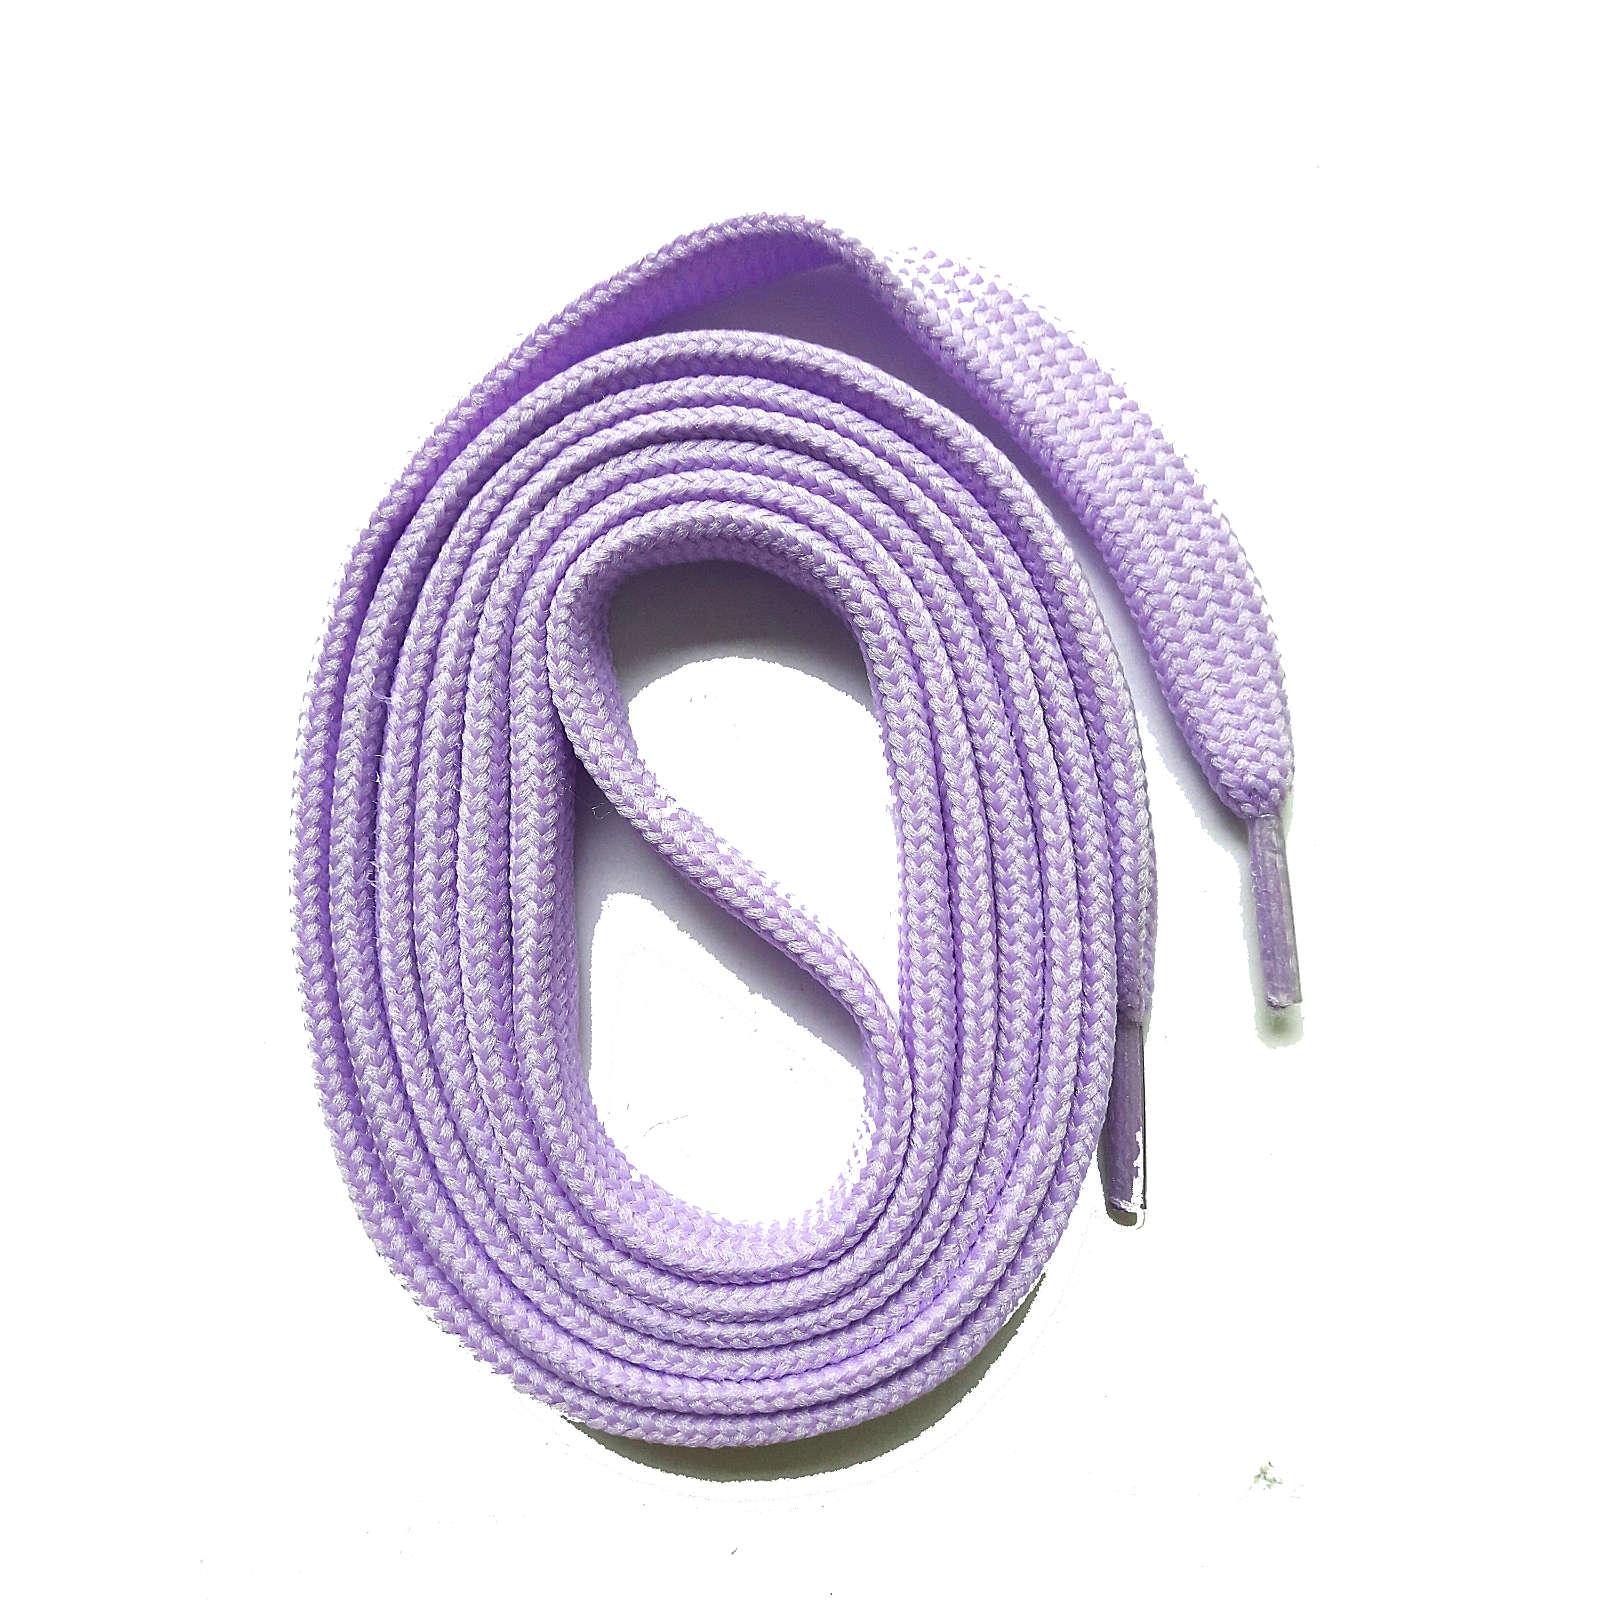 SNORS shoefriends SNORS Schnürsenkel flach 60-240cm, 7mm aus Polyester Schnürsenkel lila Gr. 60